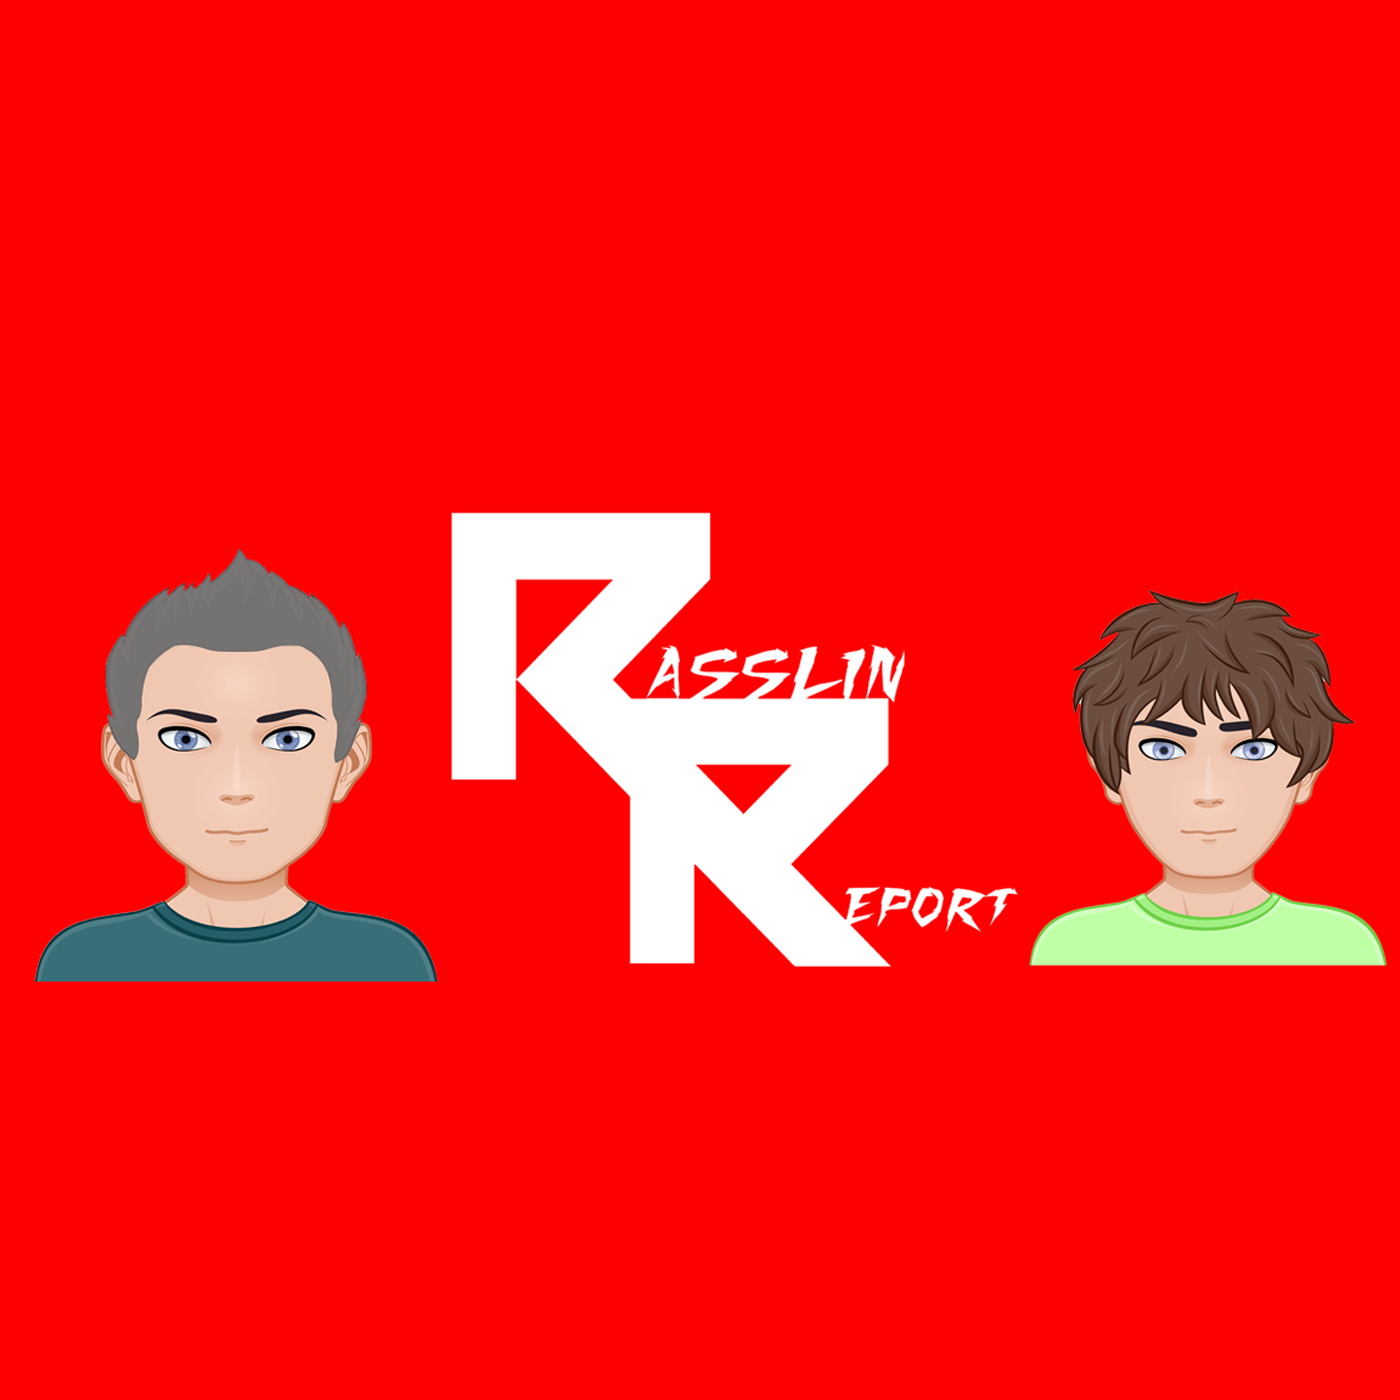 Rasslin Report